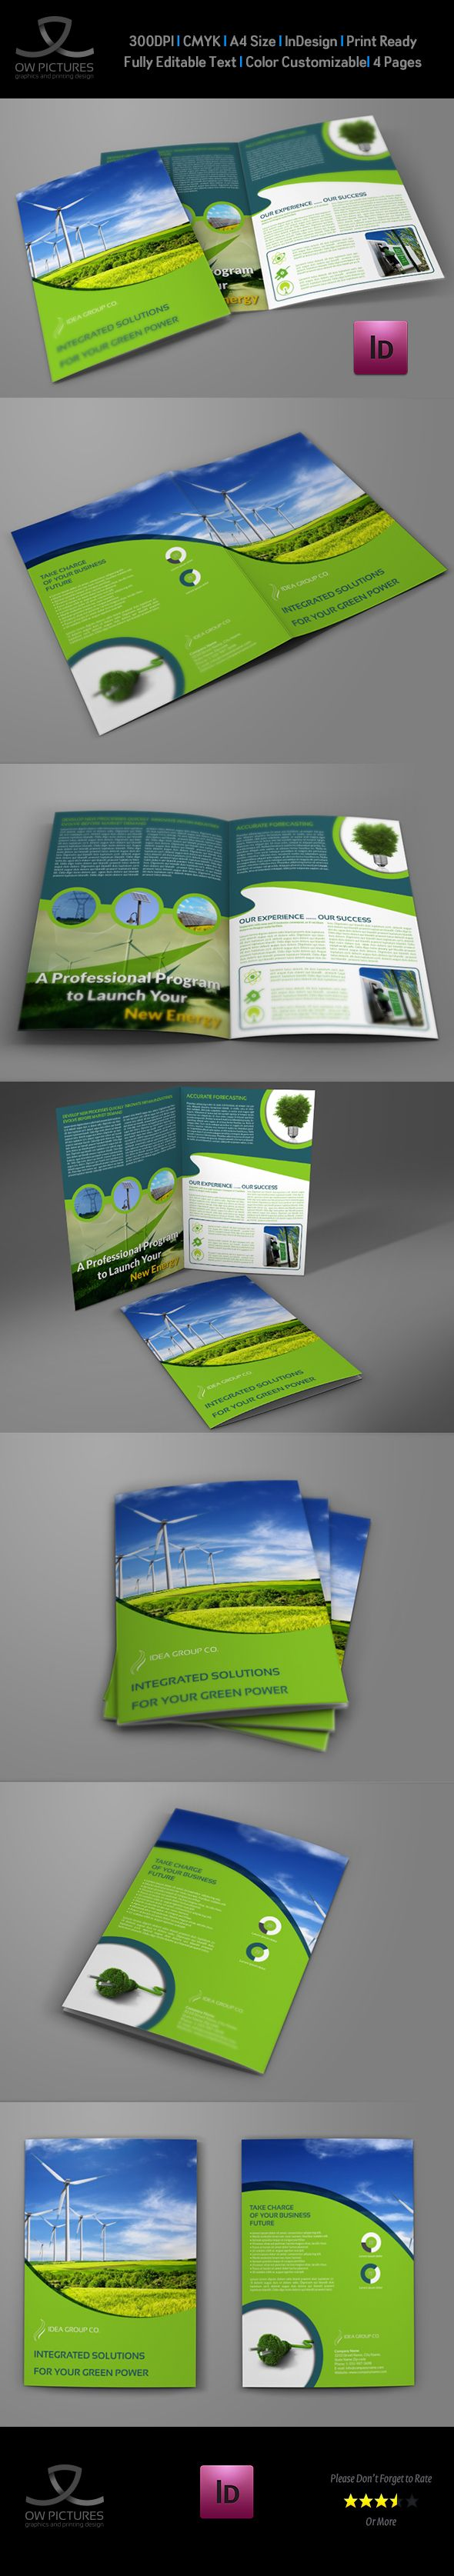 Green Energy Company Brochure Bi-Fold Template on Behance